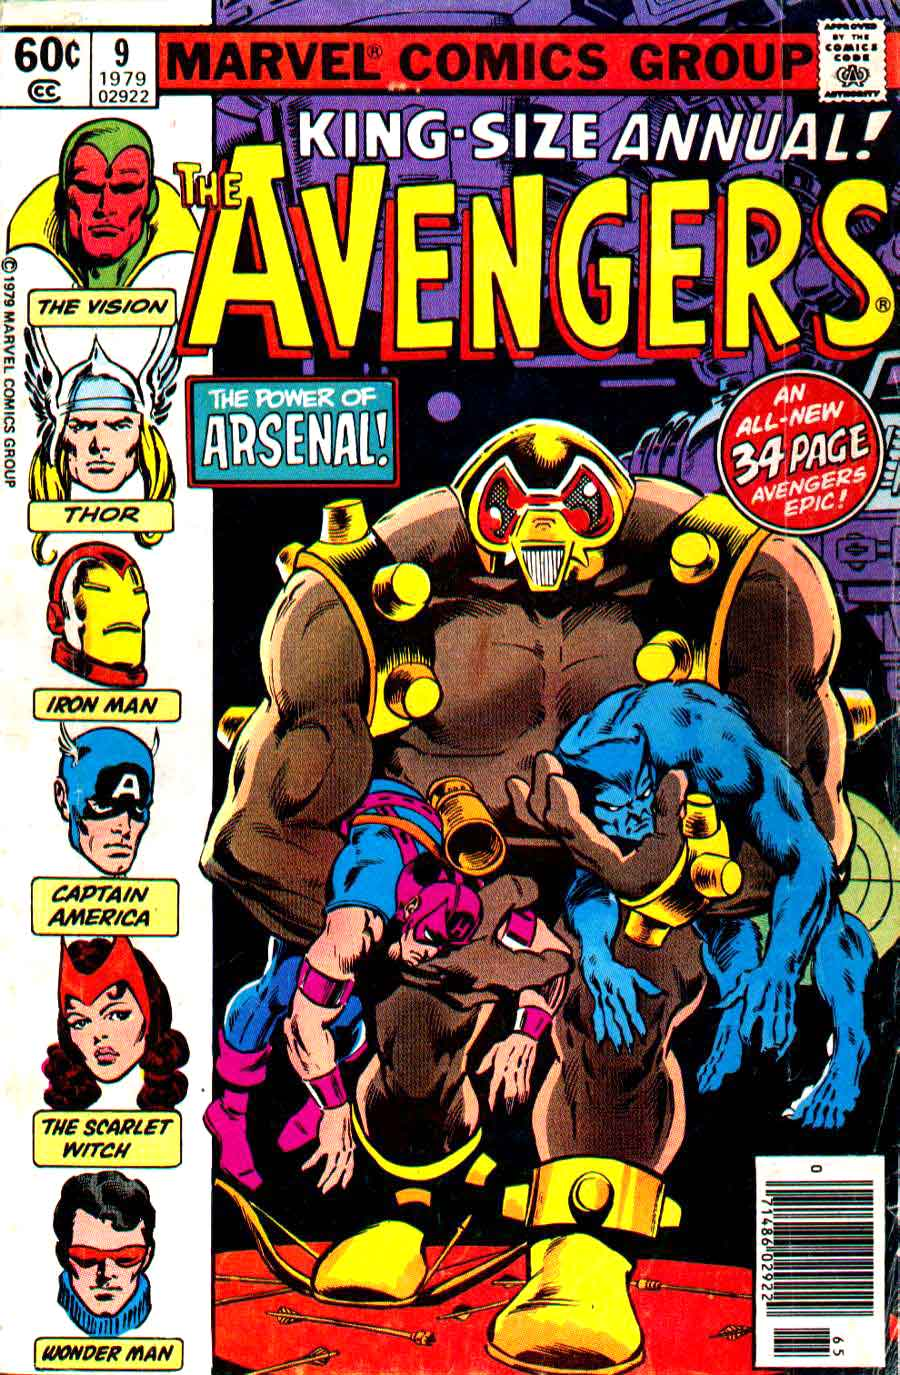 Avengers annual v1 #9 marvel comic book cover art by Don Newton